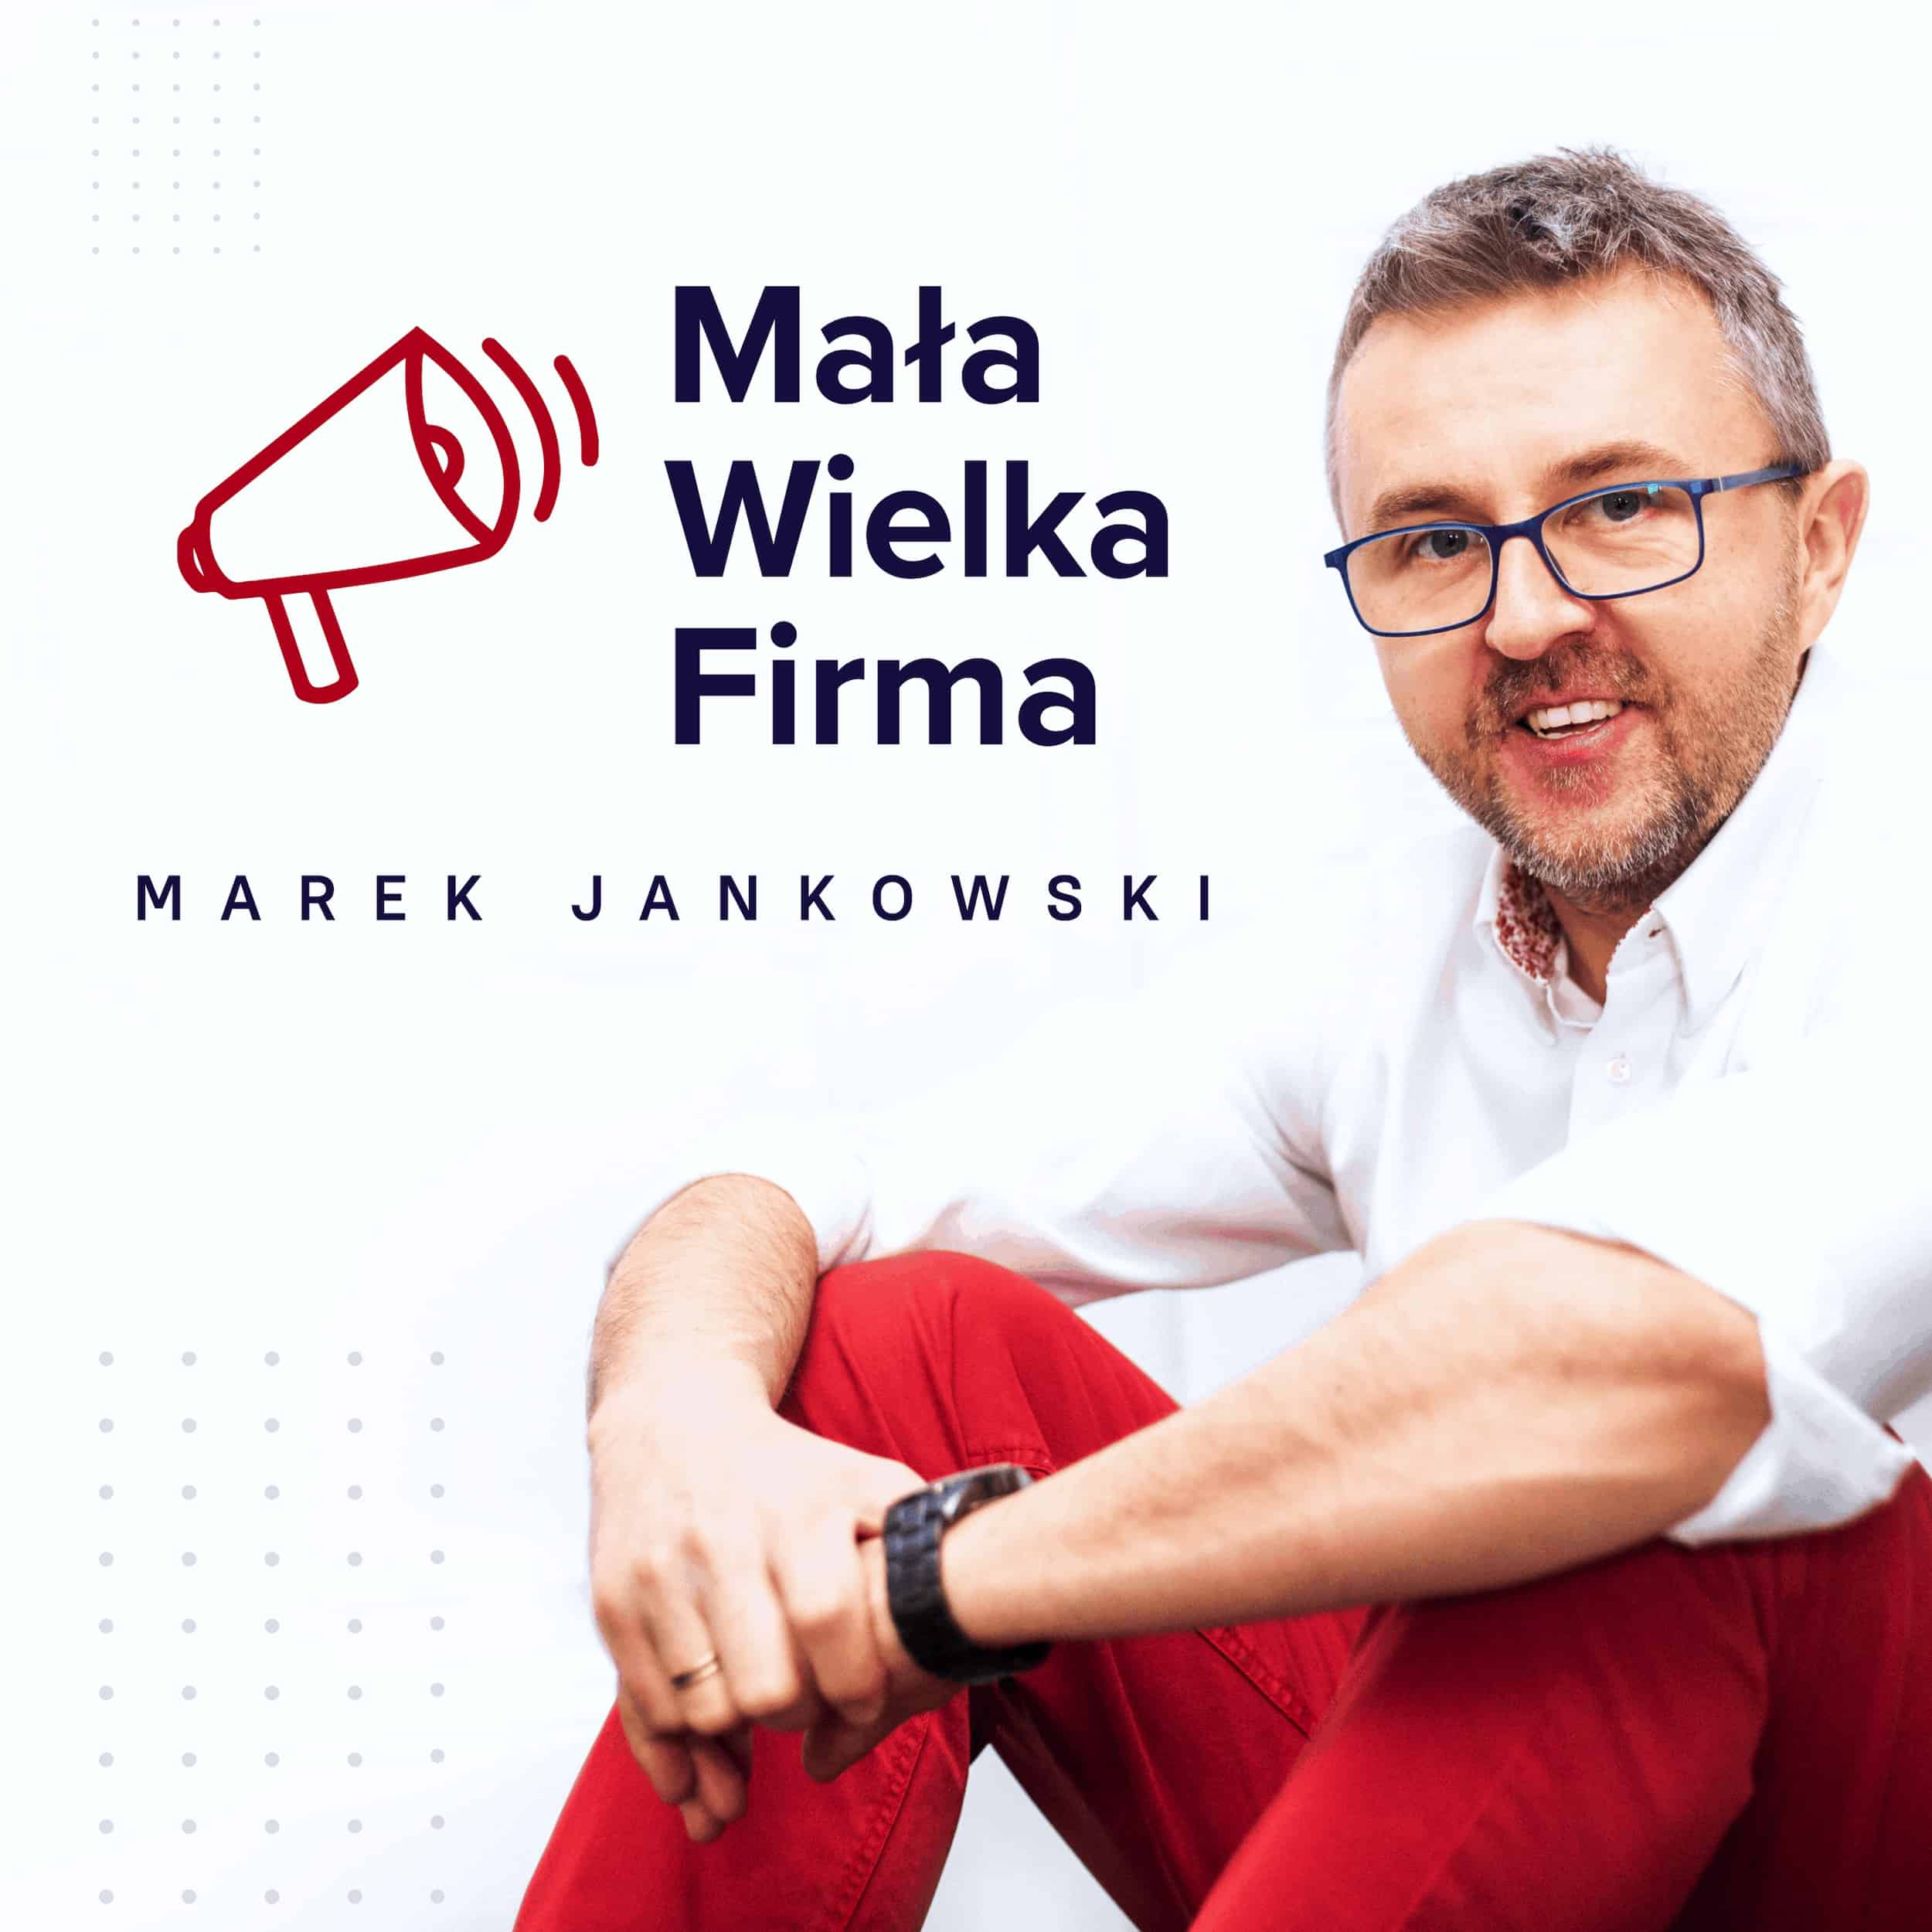 A highlight from 376: Czy szczero si opaca? | Janina Bk